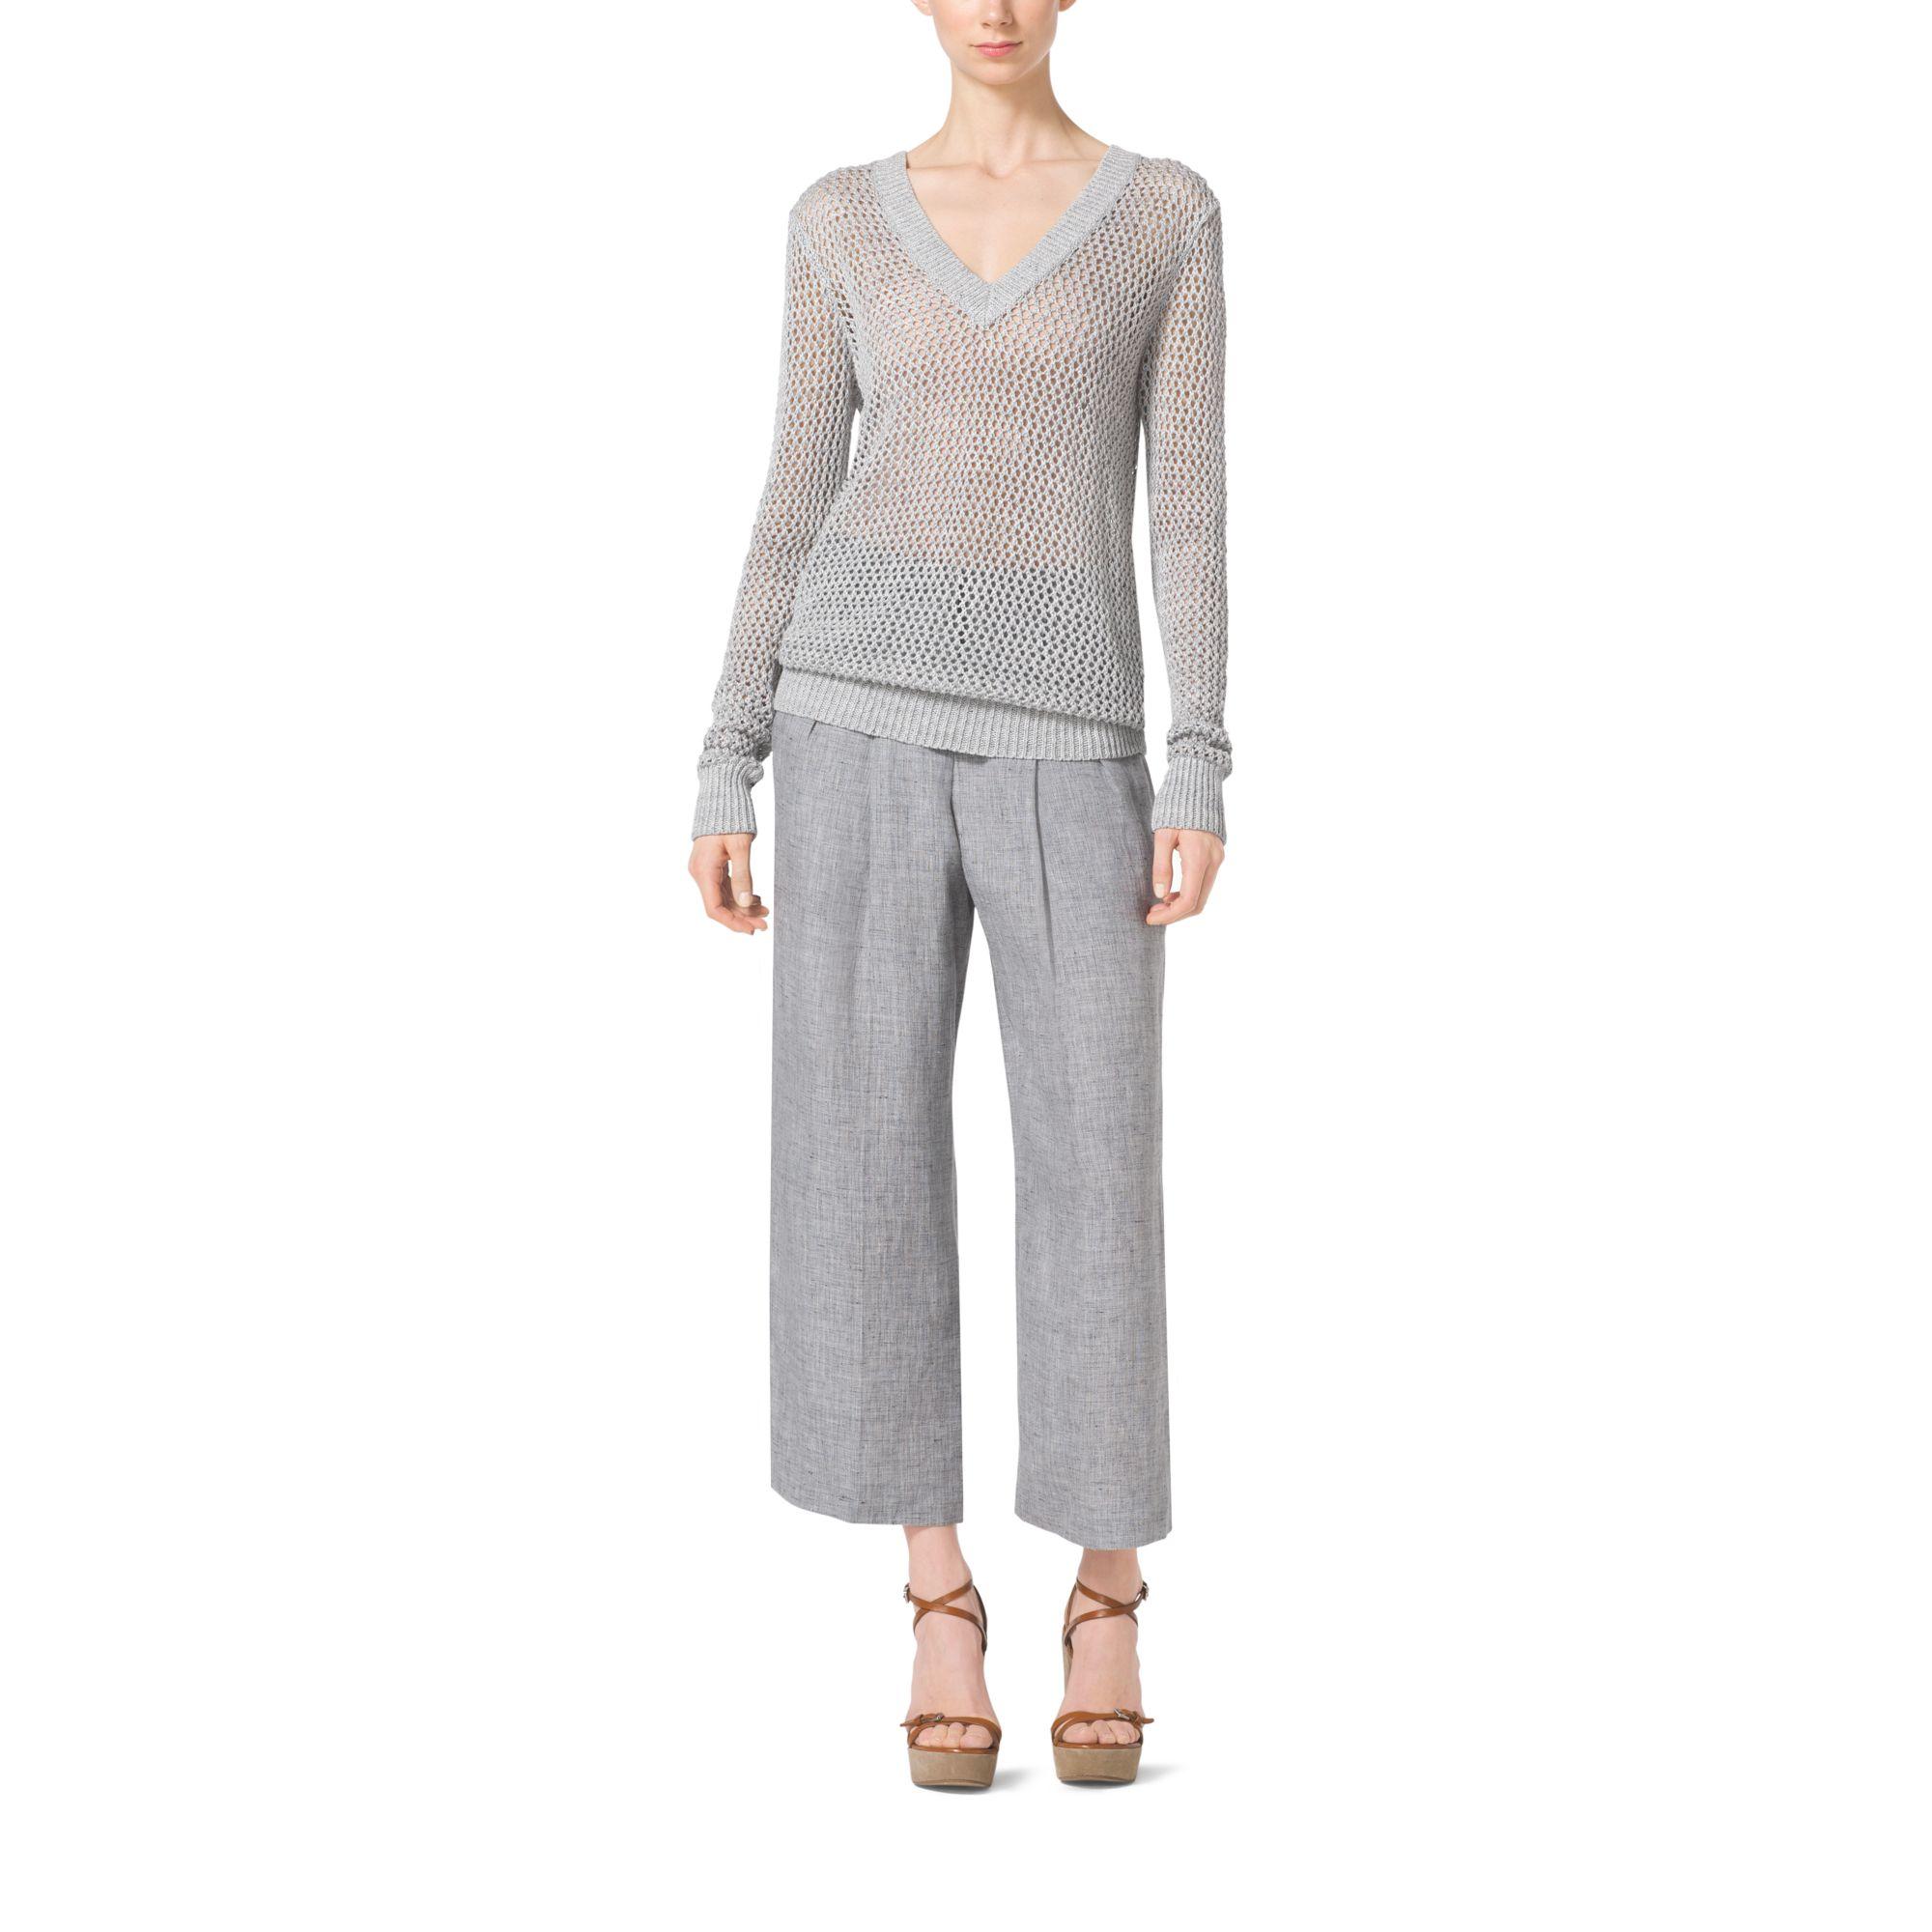 New Donna Karan Linenblend Pants In Gray  Lyst